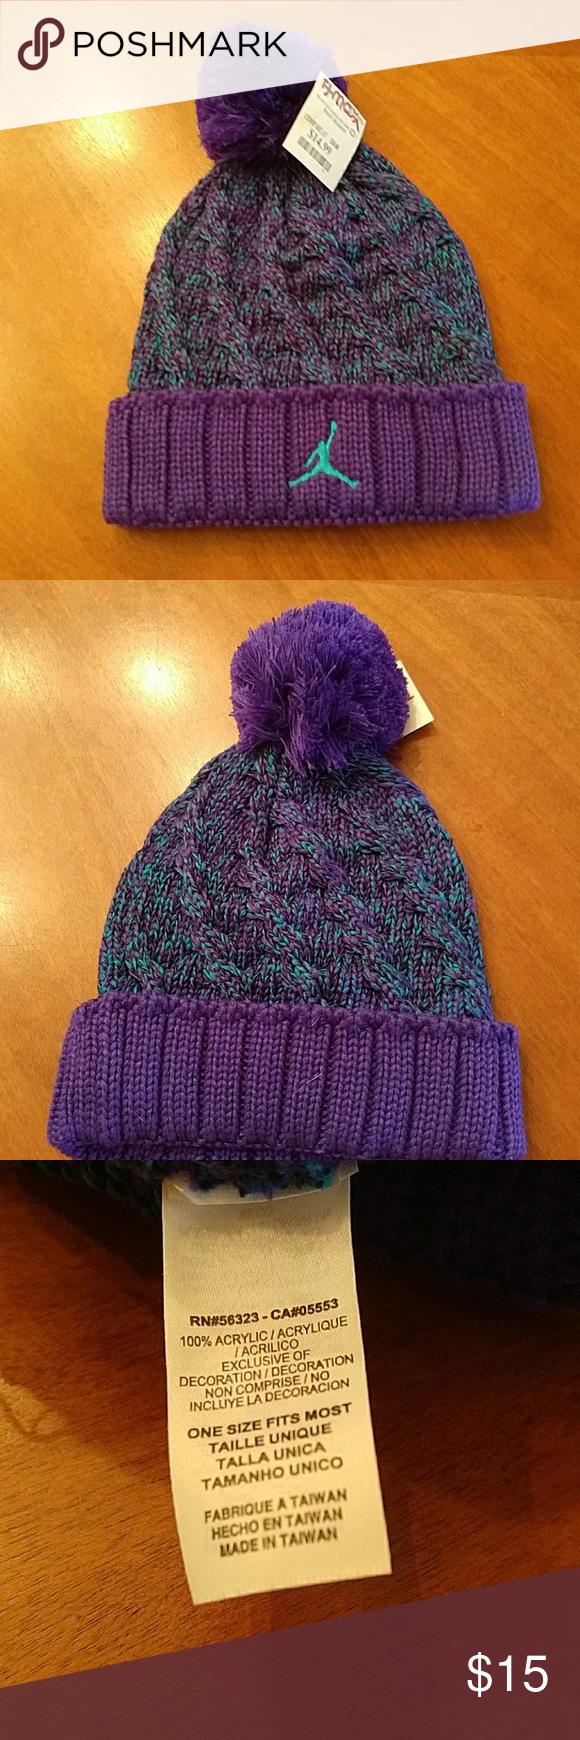 049ad6dd7ae Jordan hat purple teal Never worn Jordan Accessories Hats